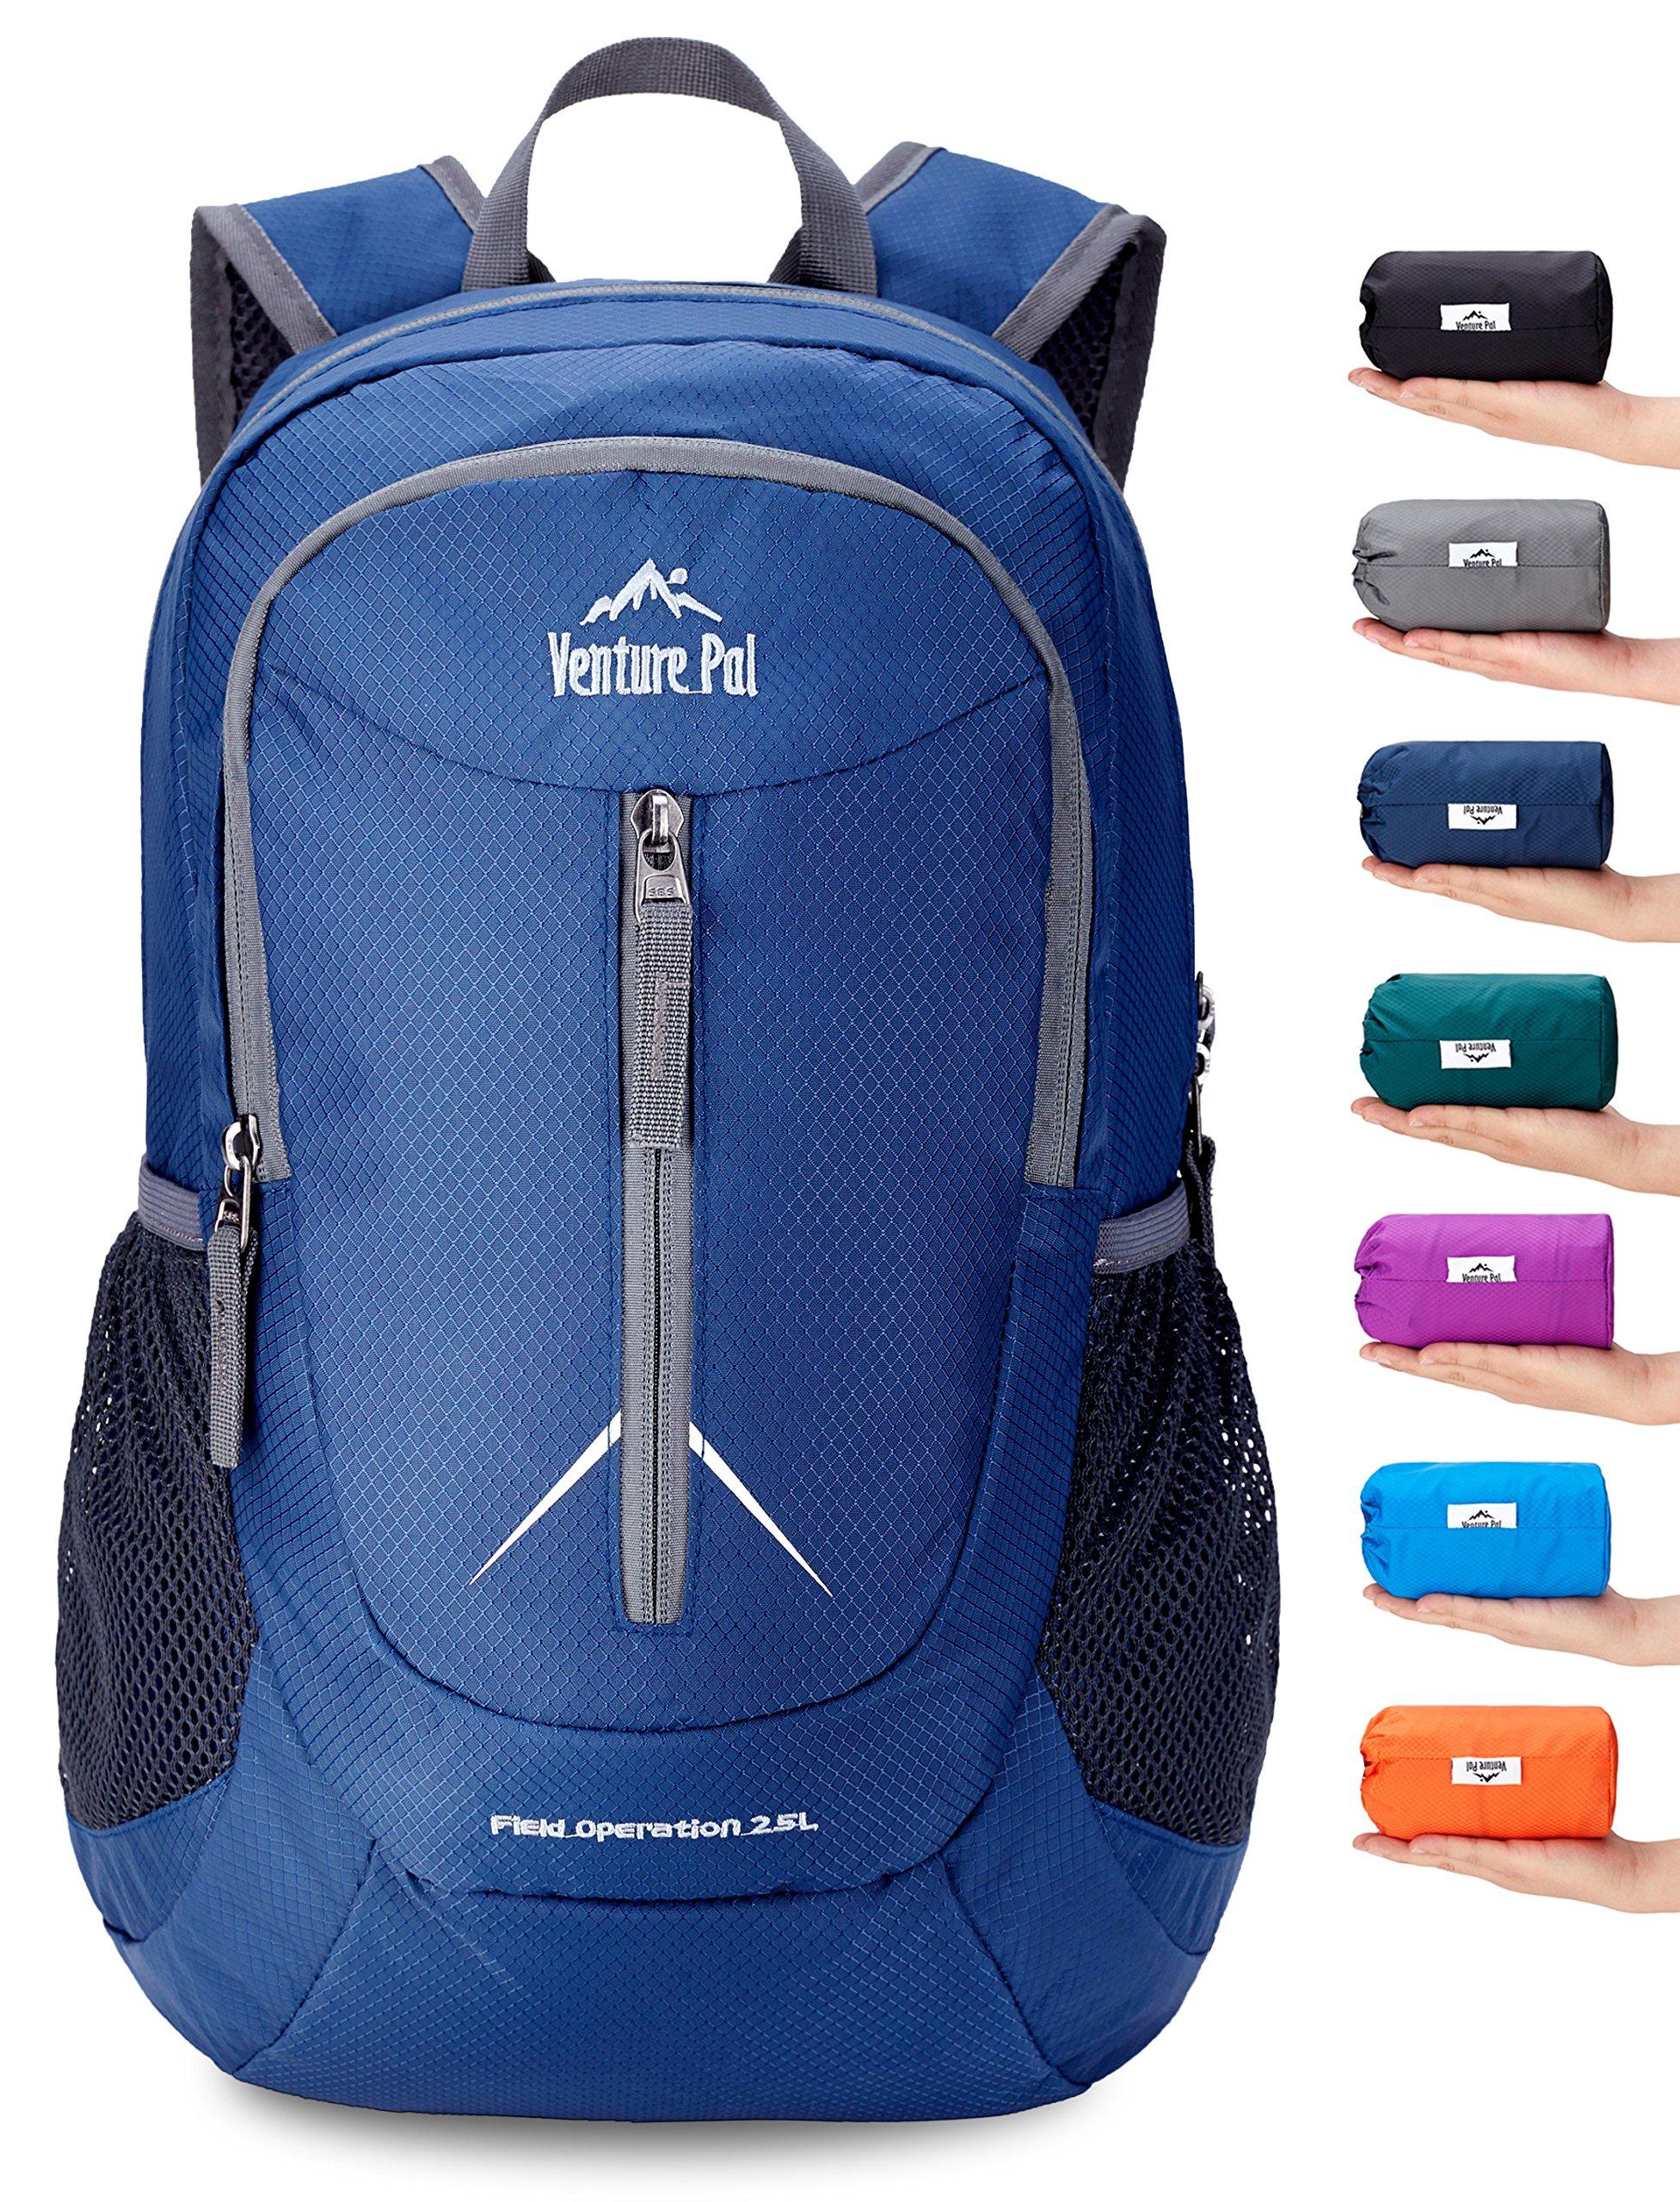 Venture Pal 25L - Durable Packable Lightweight Travel Hiking Backpack Daypack Small Bag for Men Women Kids (Navy)